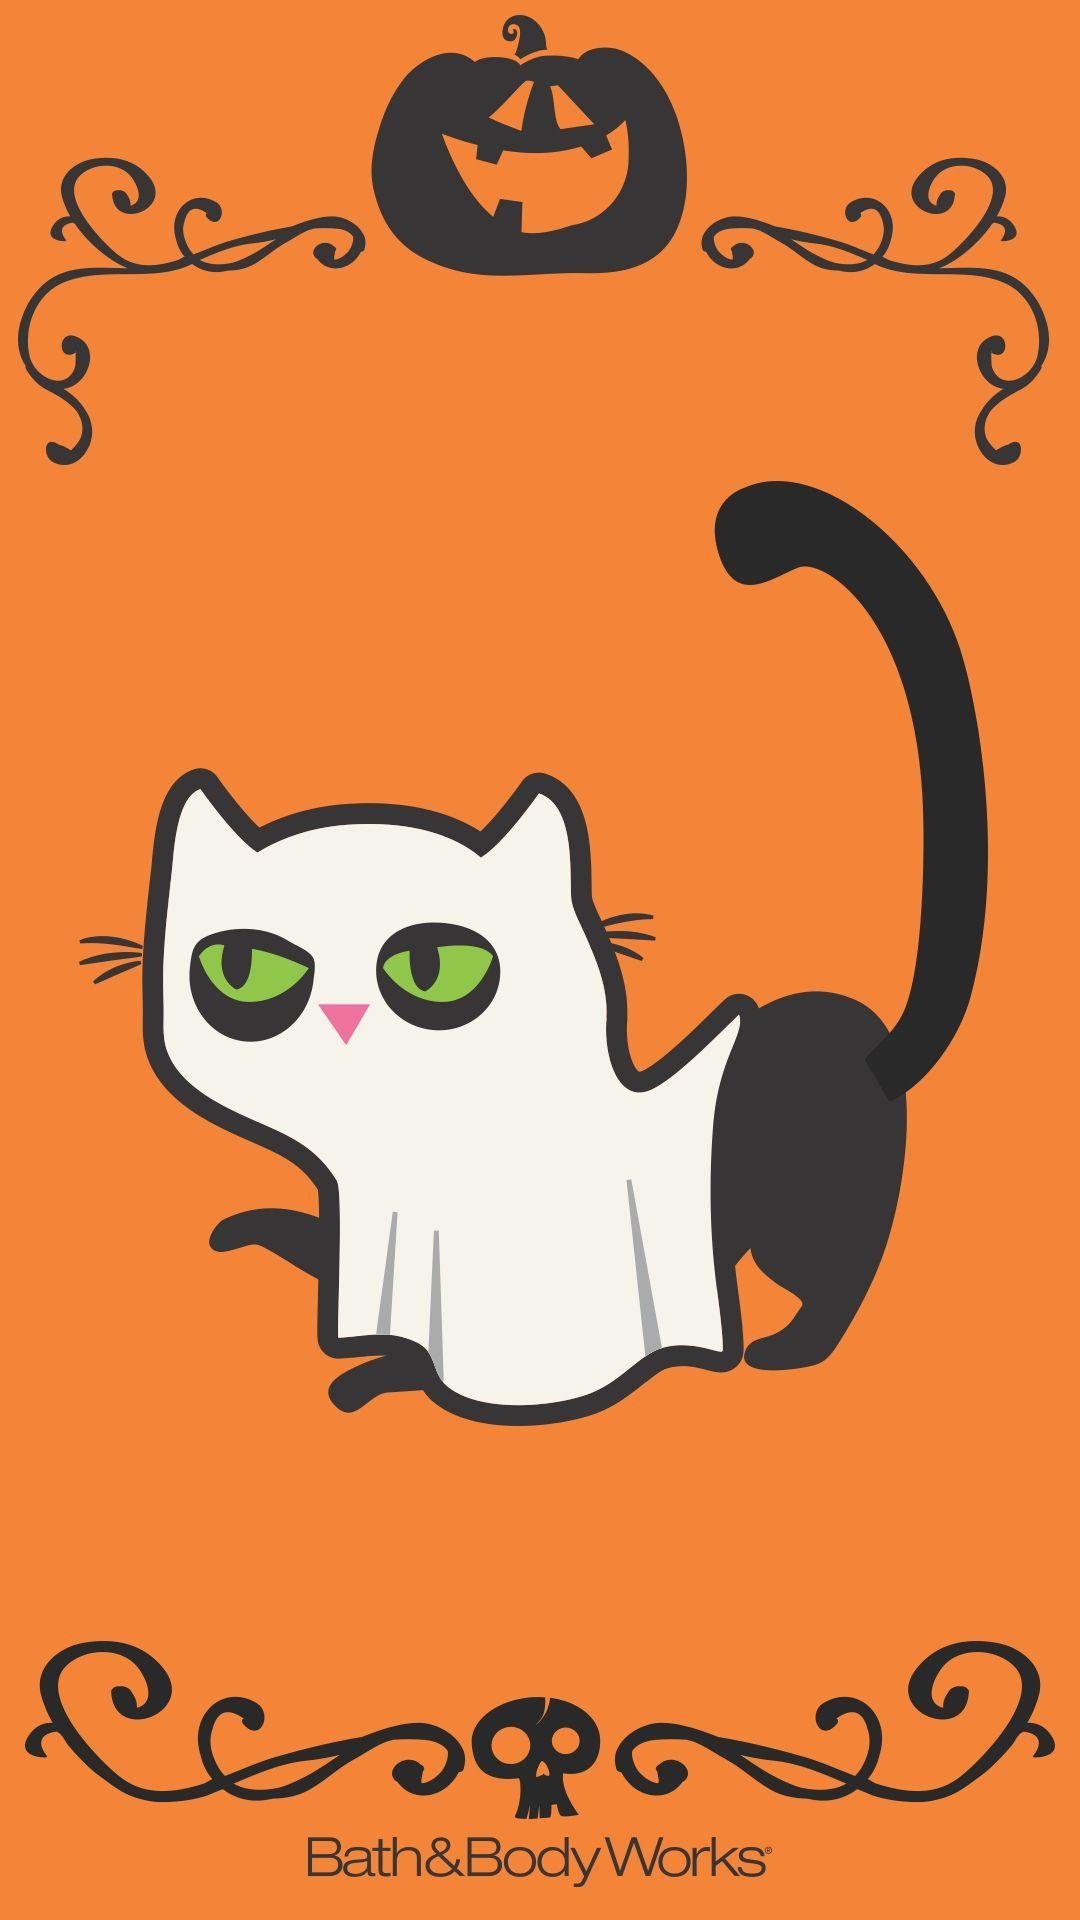 1080x1920 pin on hella phone wallpapers. Black Cat Iphone Wallpaper 100 Iphone In 2020 Kawaii Background Halloween Cat Cat Wallpaper